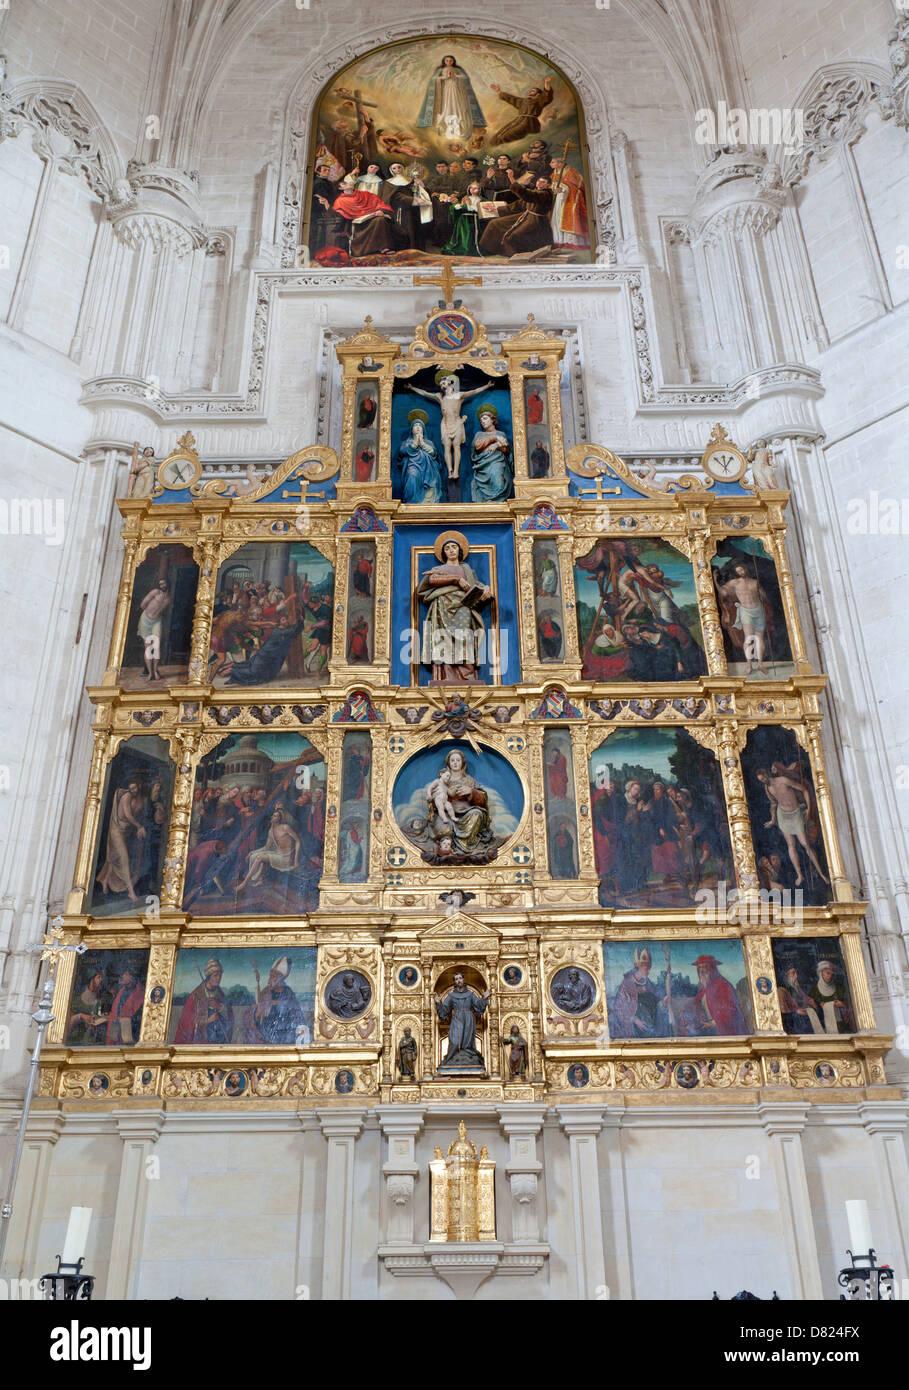 TOLEDO - MARCH 8: Gothic main altar of Monasterio San Juan de los Reyes or Monastery of Saint John of the Kings - Stock Image